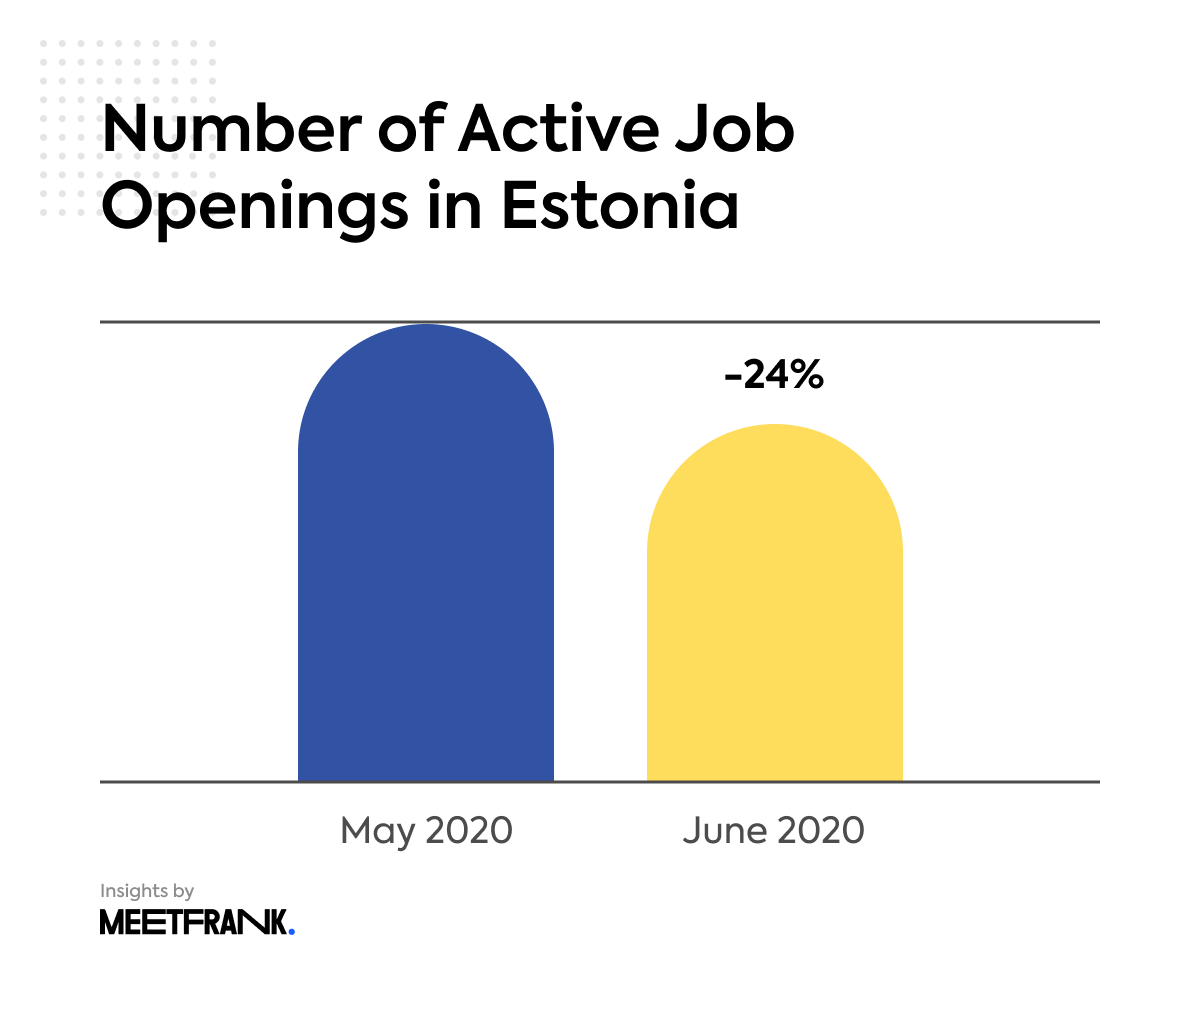 active job openings in Estonia